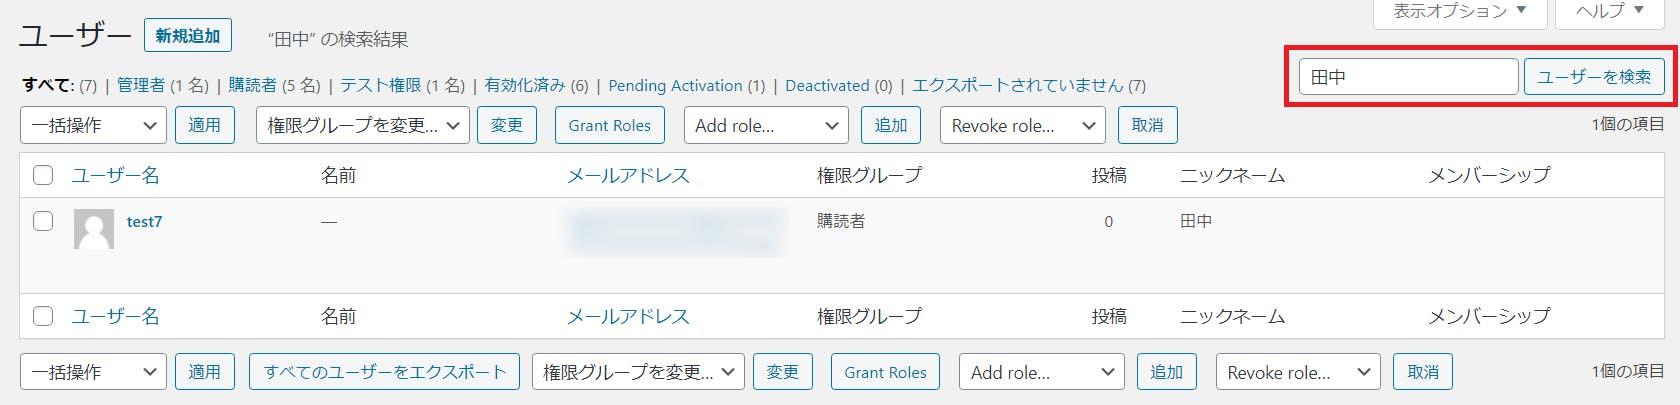 WP-Membersのフィールドの編集(ユーザーの検索)